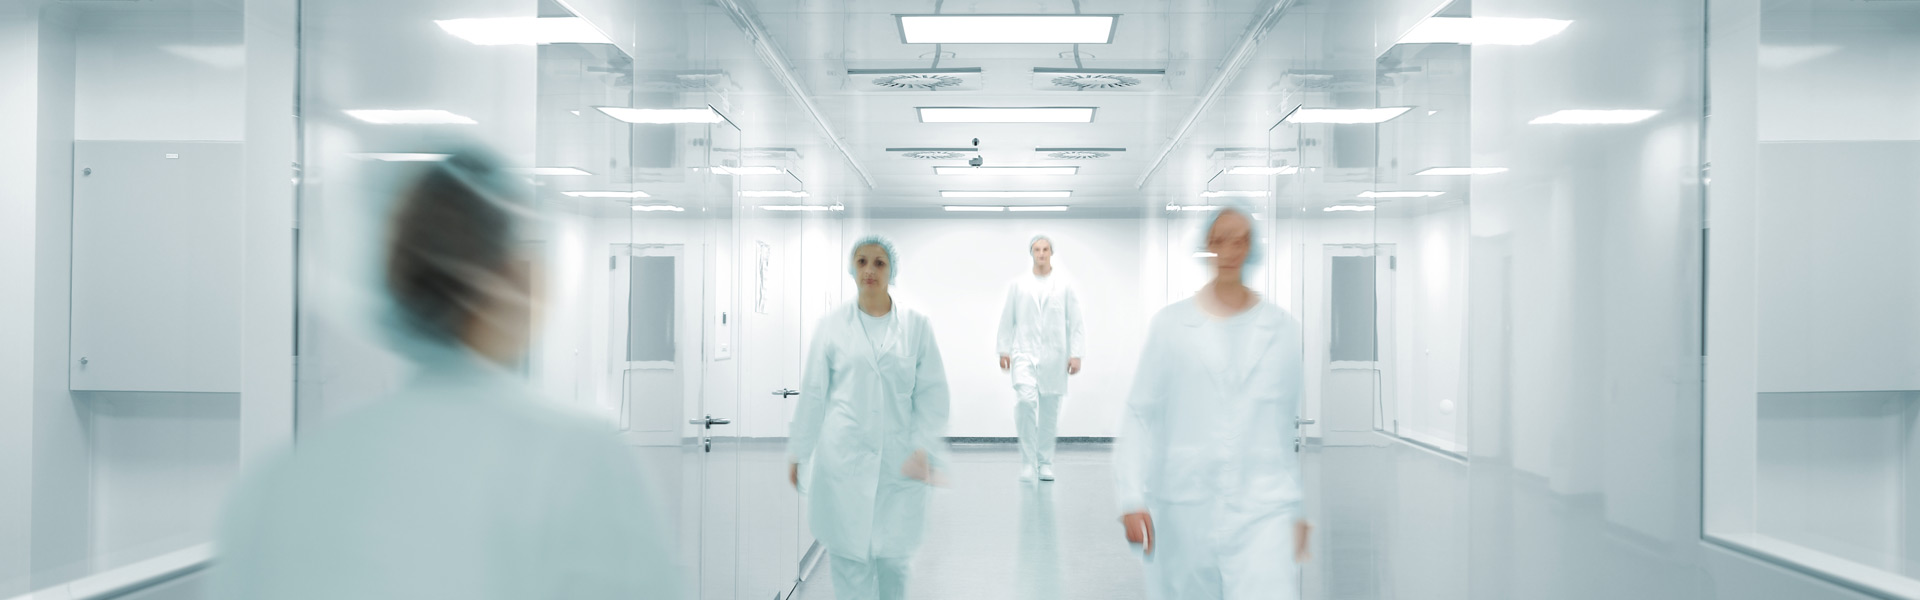 chirurgiens esthétiques Tunisie